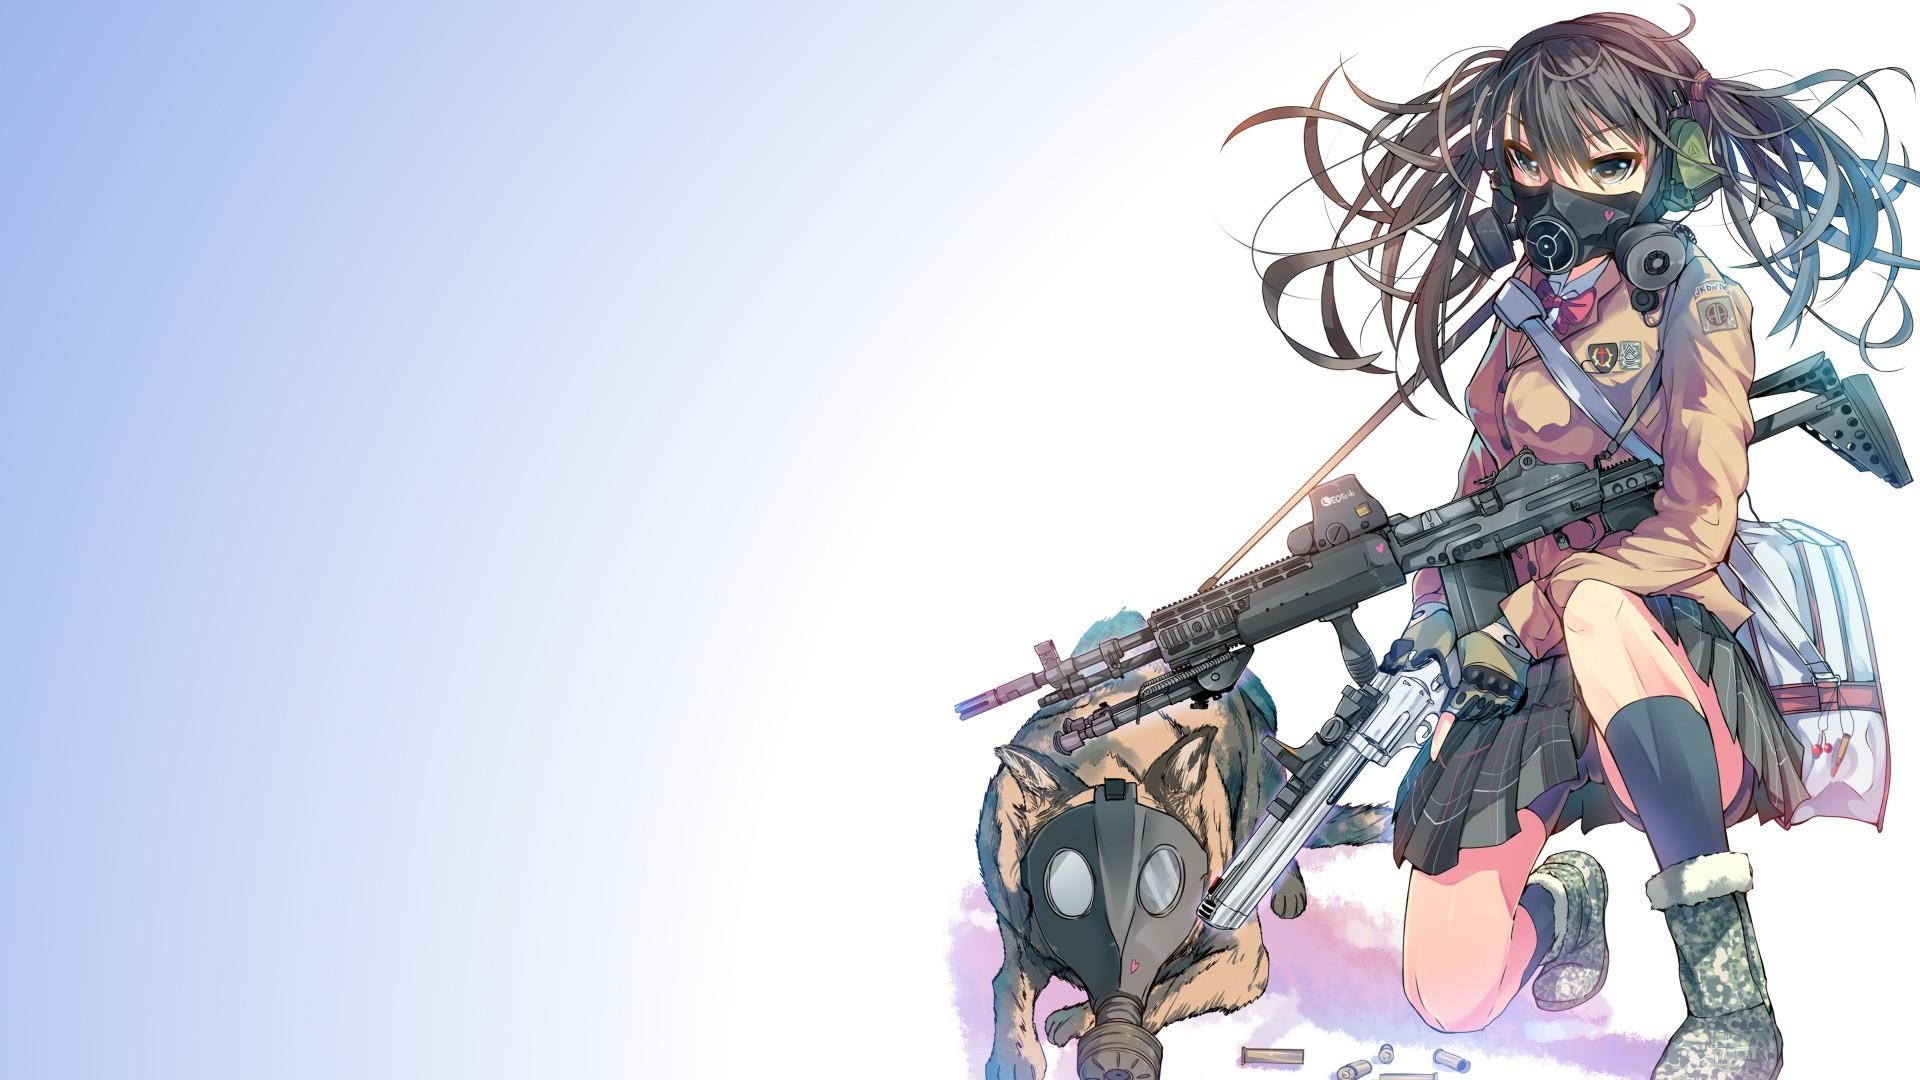 Anime anime anime girls gun German Shepherd .357 Magnum weapon  twintails original characters Daito